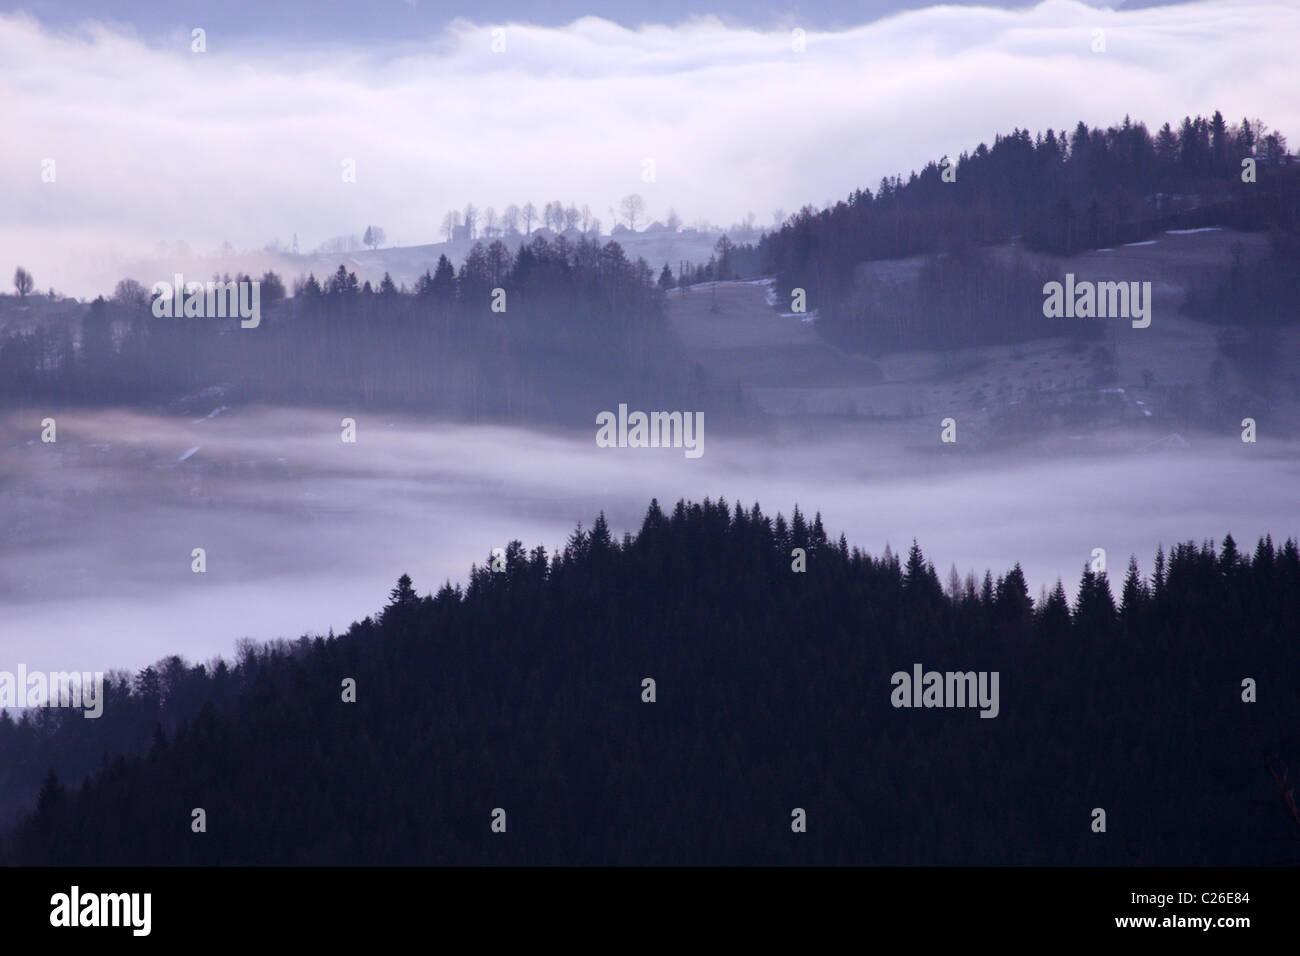 Morning fogs over the Carpathian Mountains, Poland - Stock Image